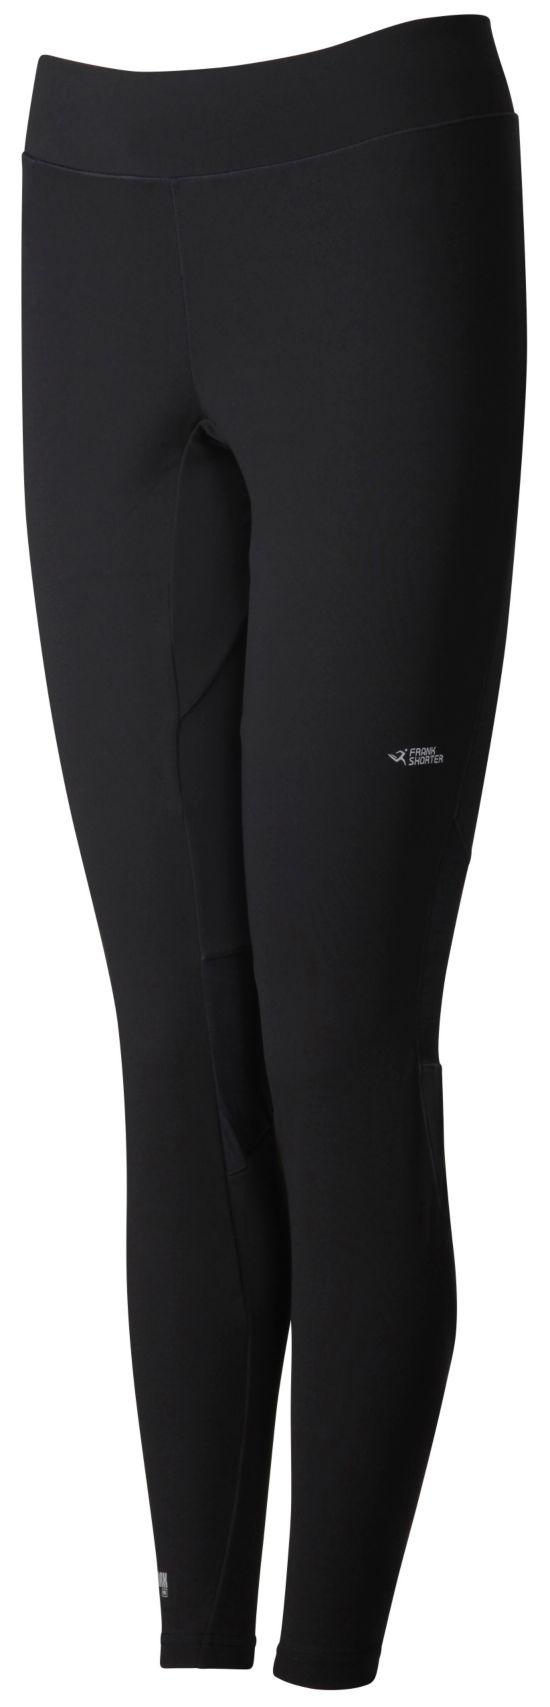 FS Risa Windprotection Tights Dame BLACK/BLACK